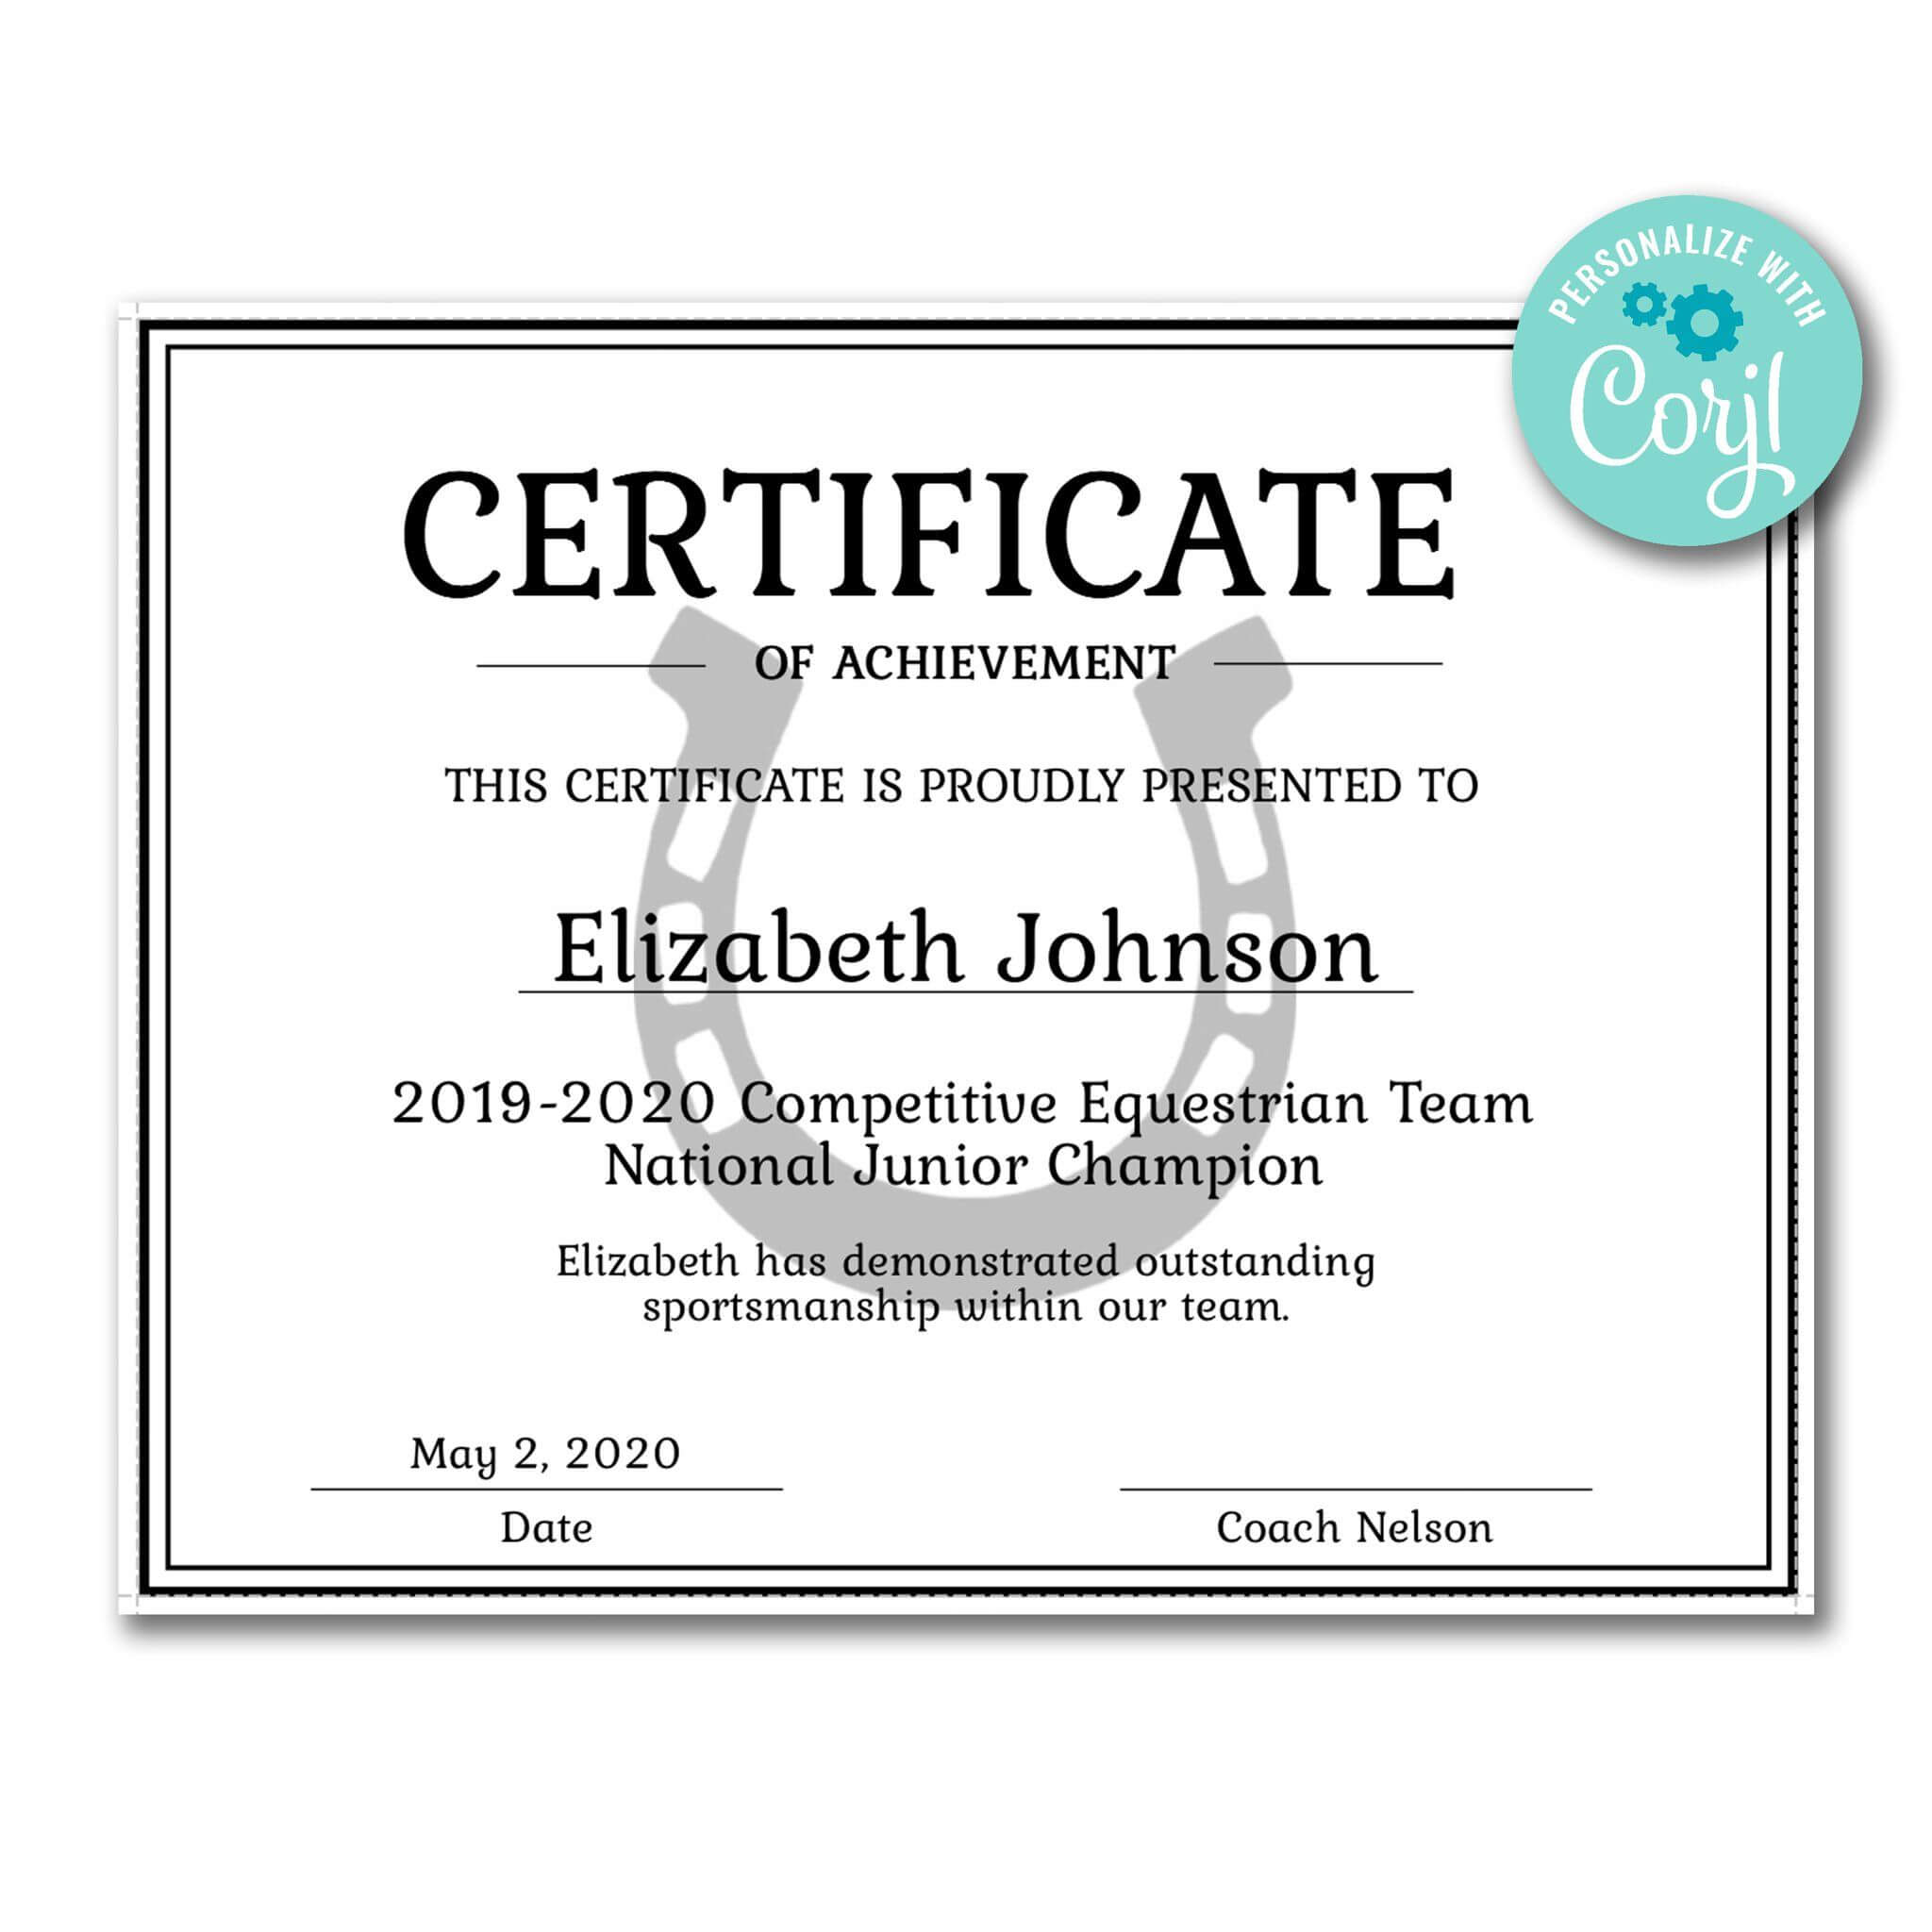 Horseshoe Certificate   Certificate Templates, Certificate in Basketball Camp Certificate Template